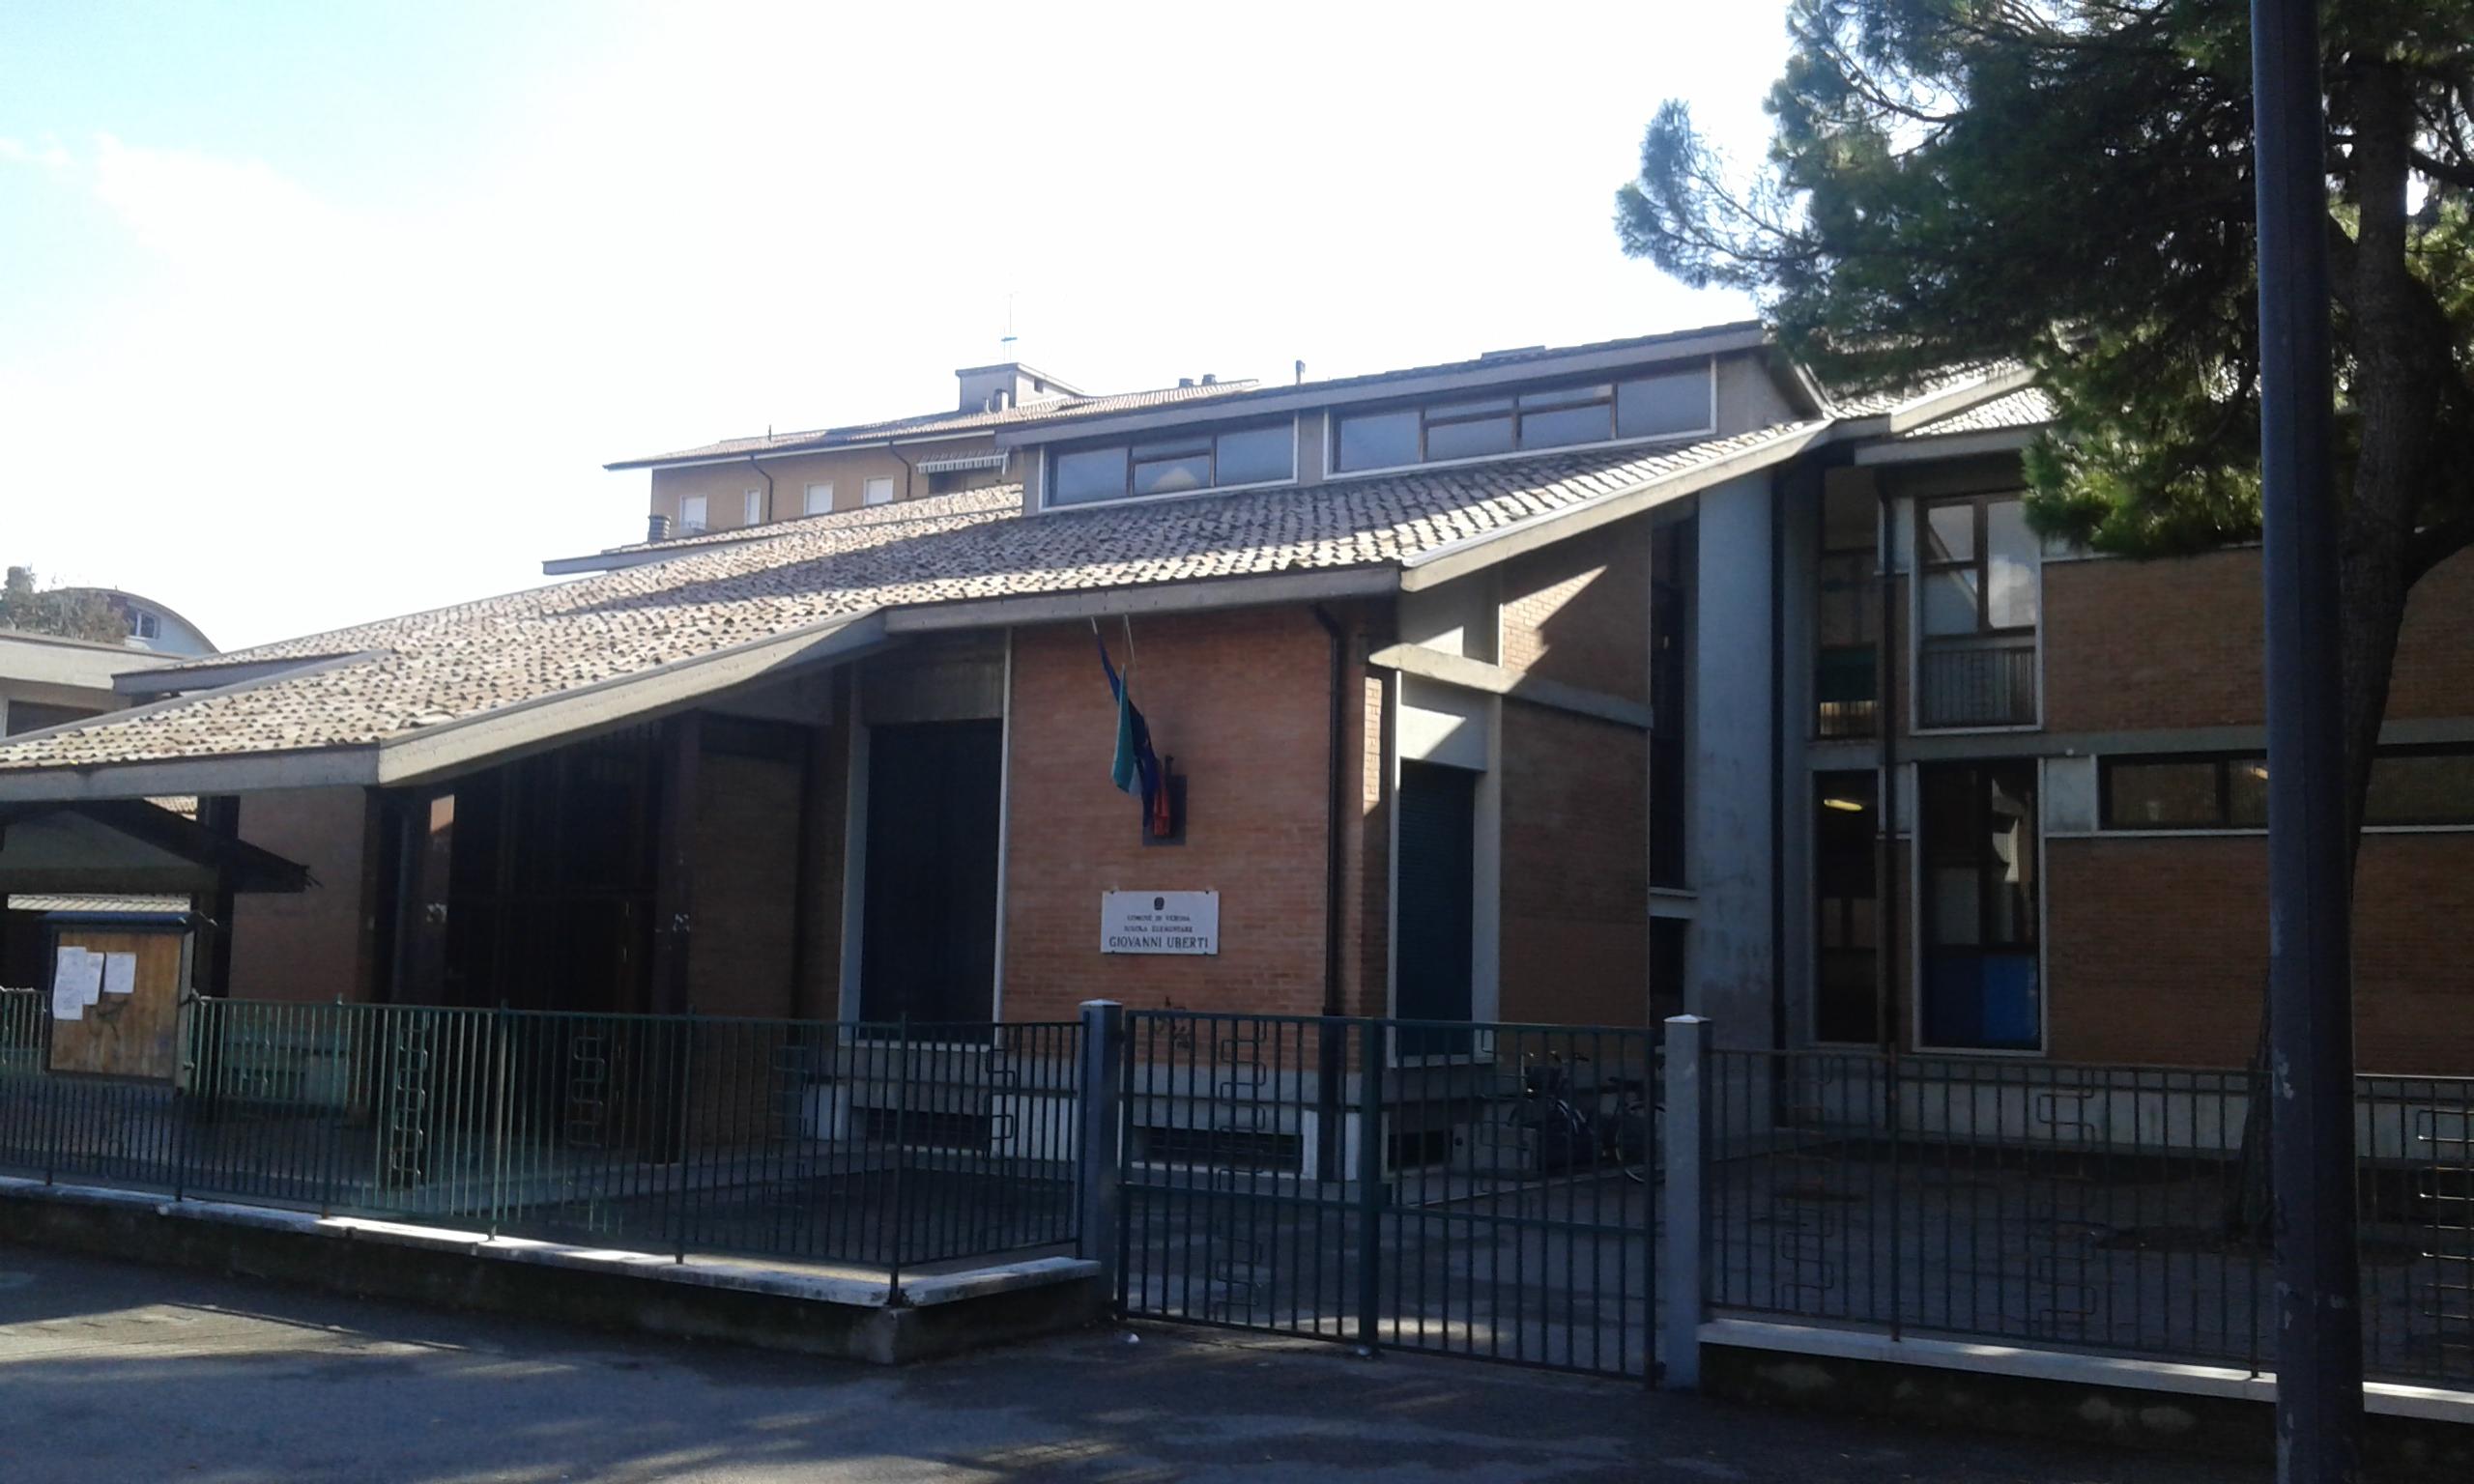 Ecologiamo a Verona